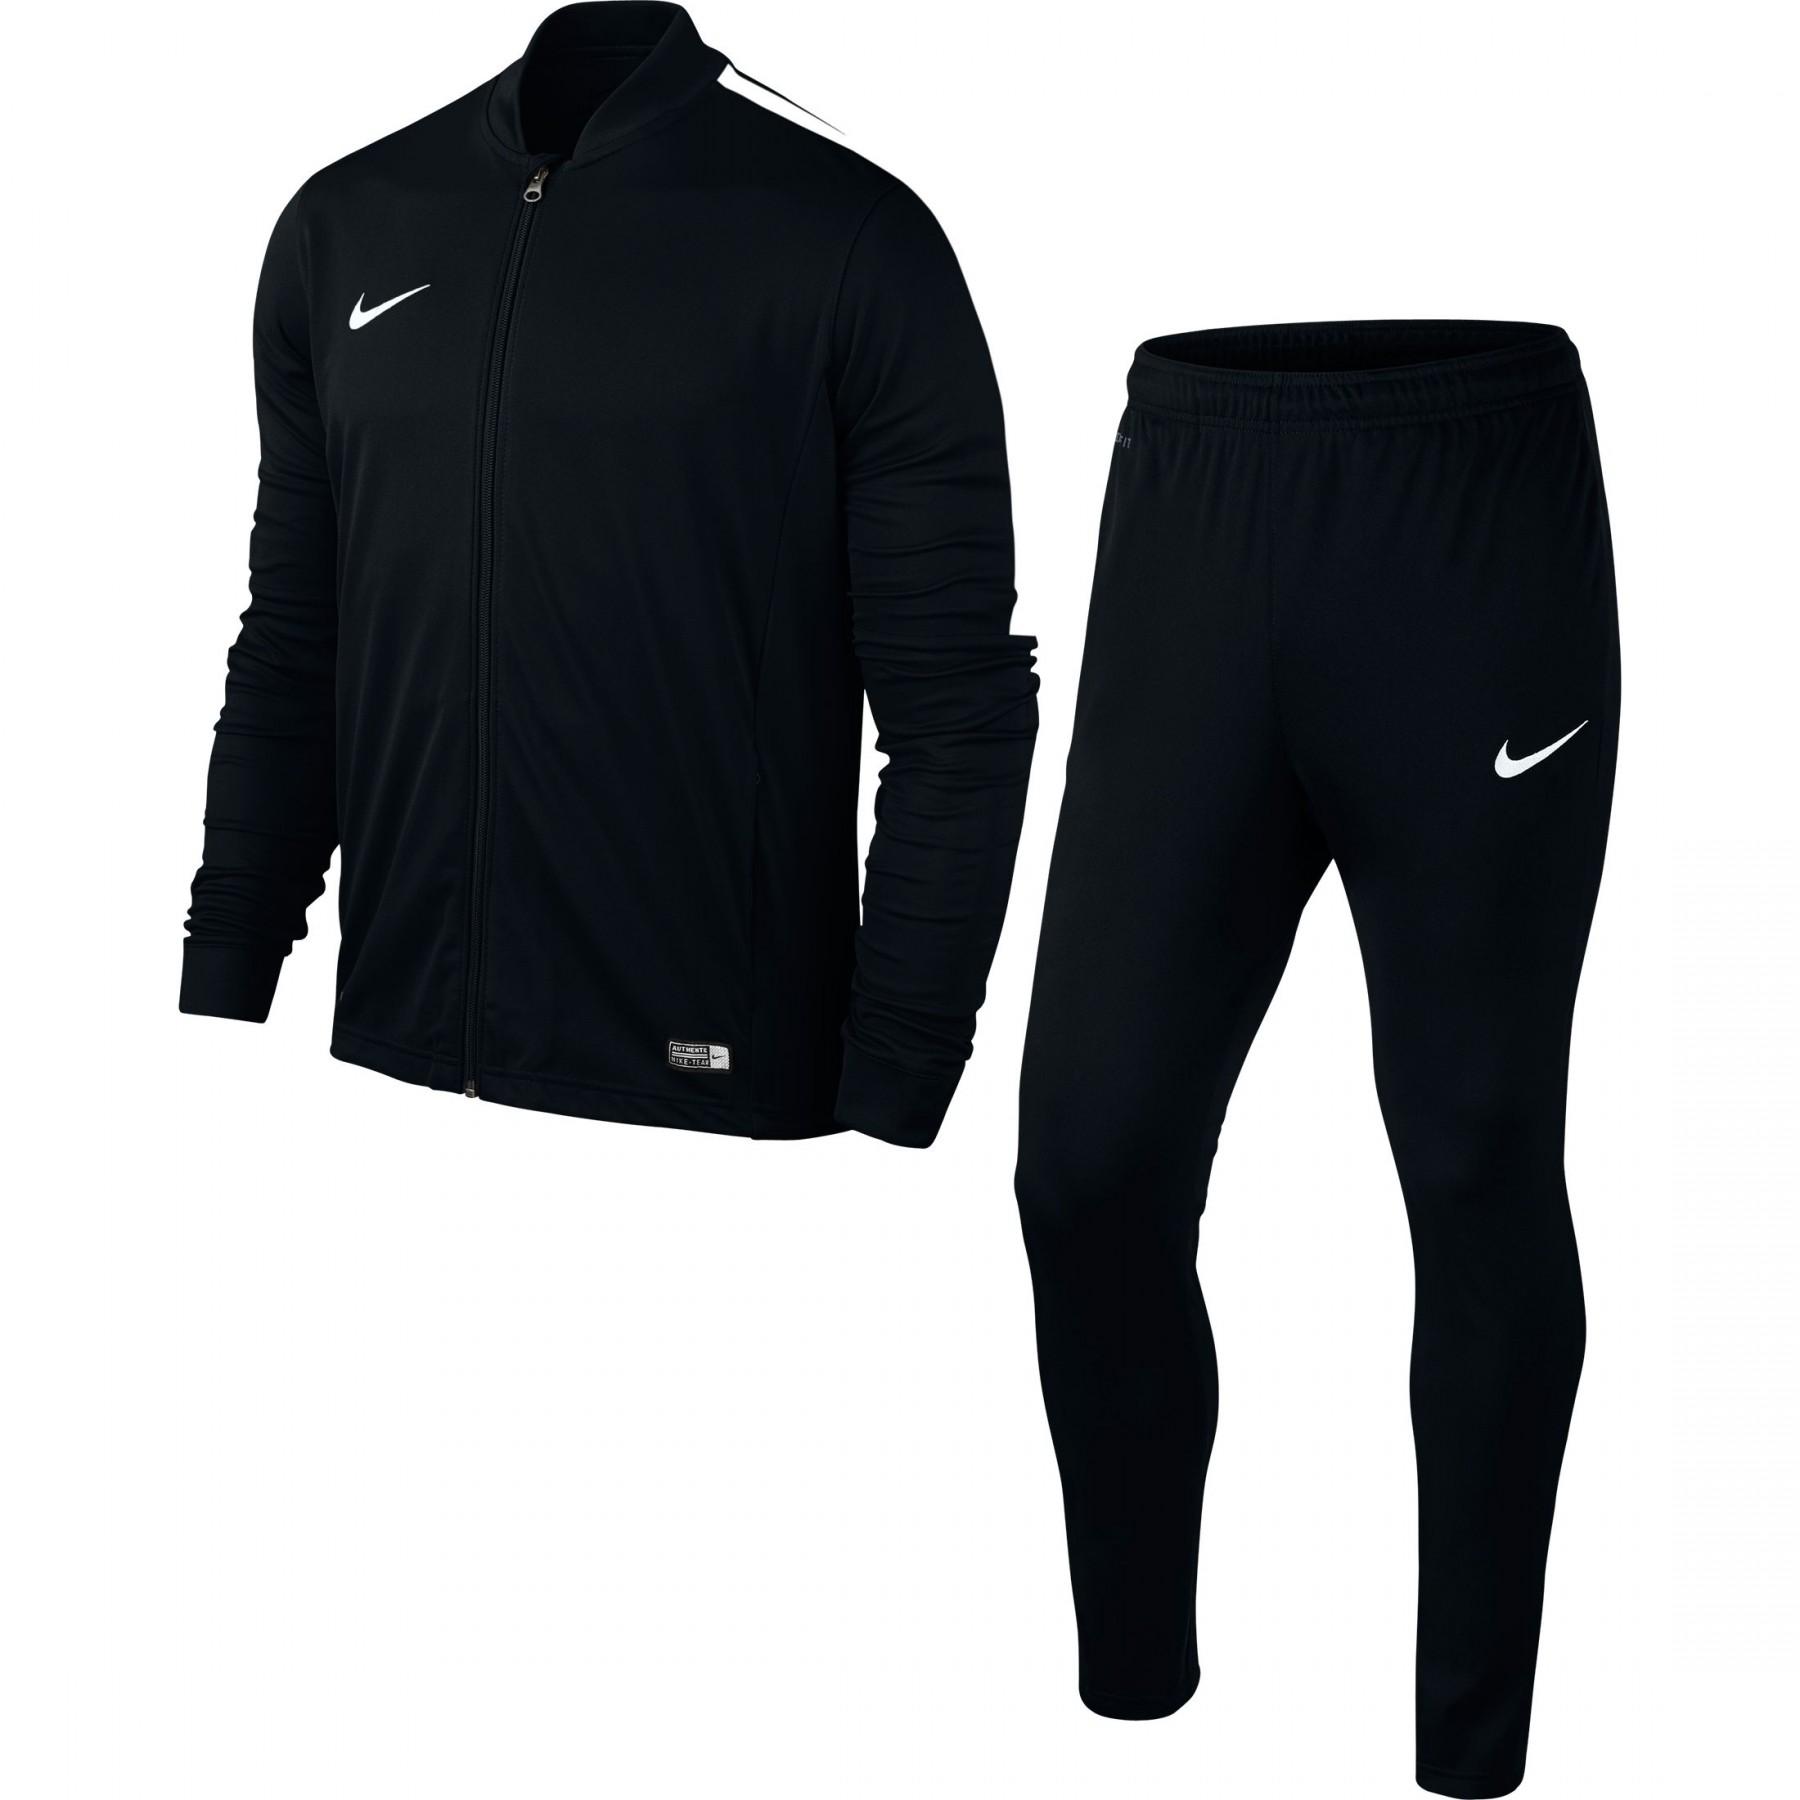 jogging noir nike homme chapka doudoune pull vetement d 39 hiver. Black Bedroom Furniture Sets. Home Design Ideas